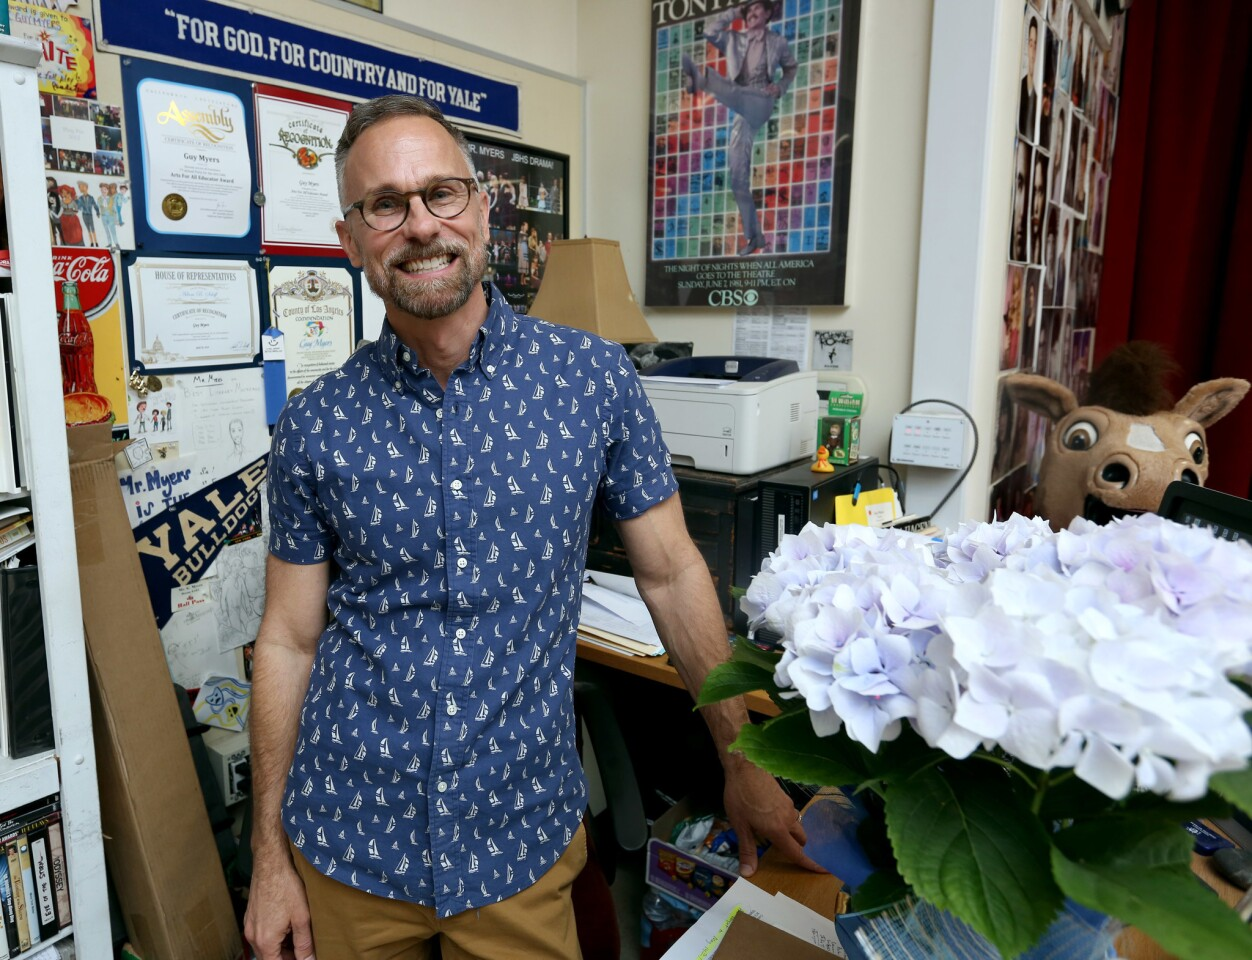 Photo Gallery: Drama teacher Meyers named Teacher of the Year